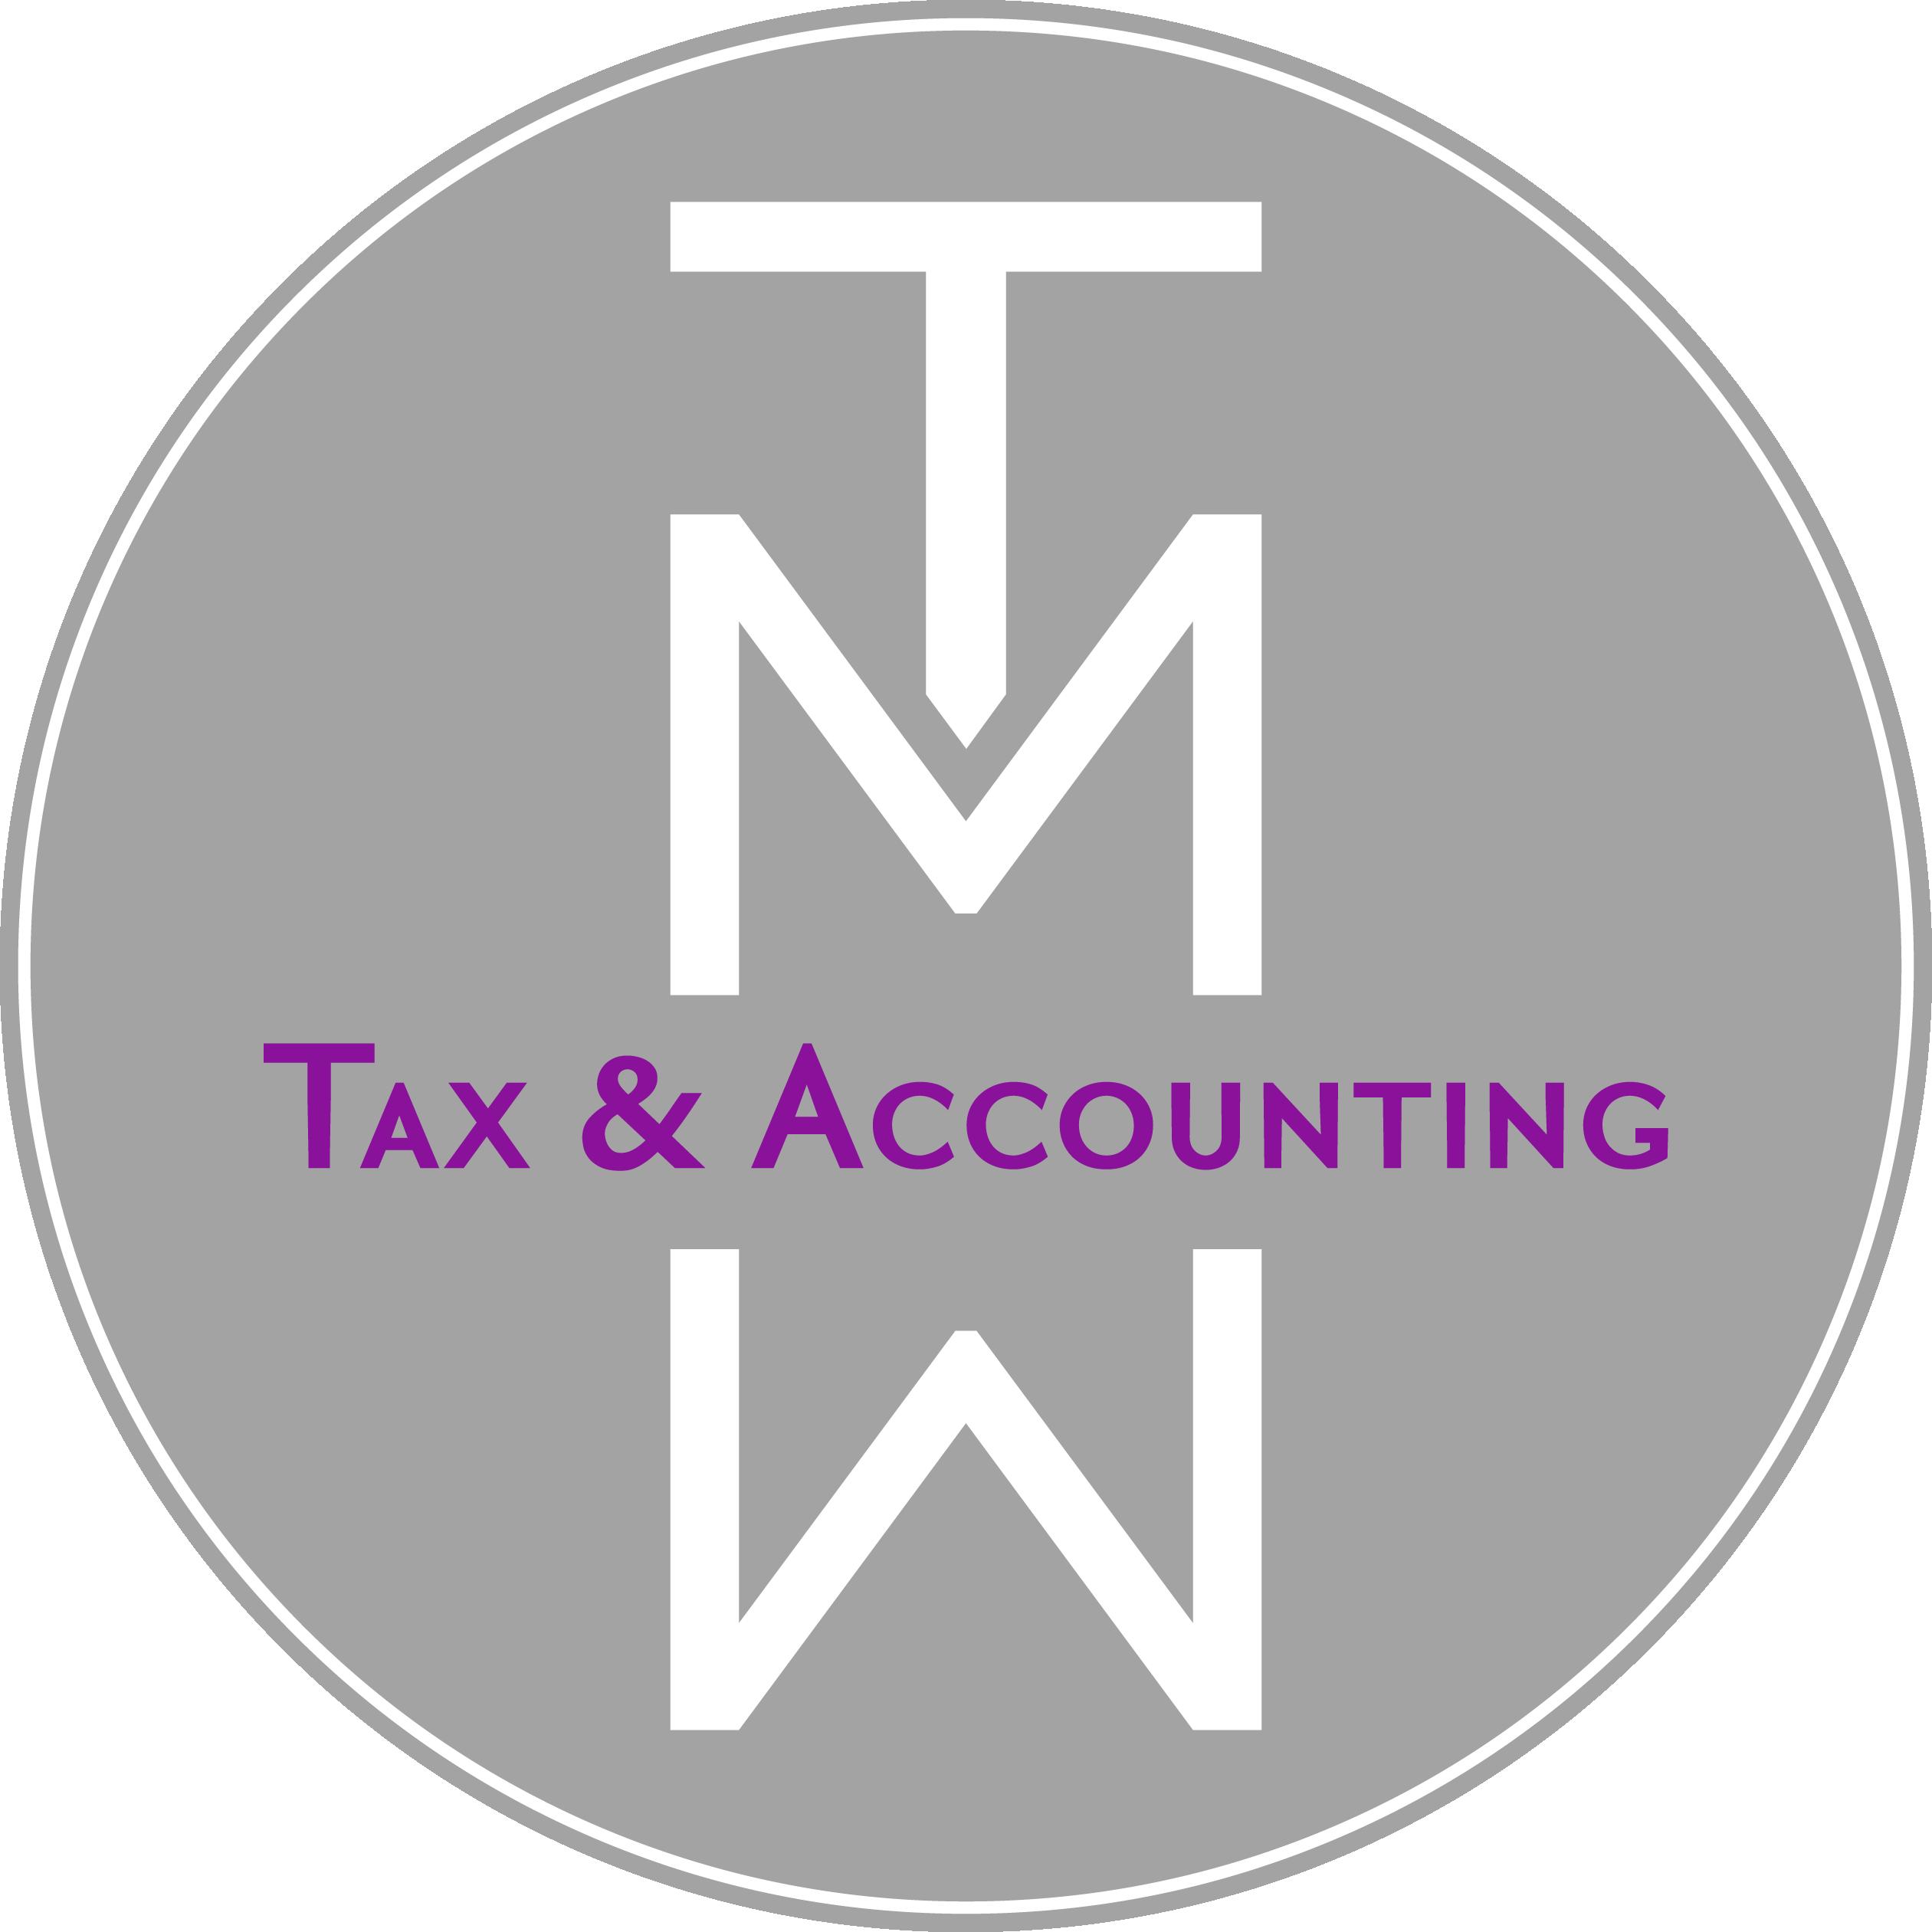 TMW Tax & Accounting LLC